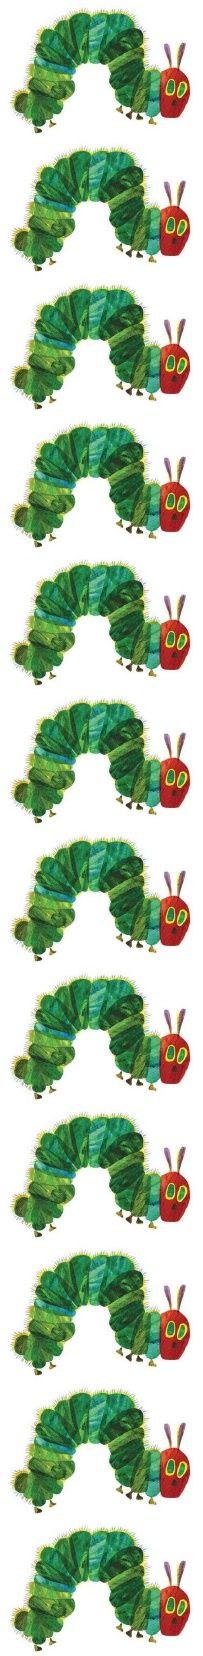 54 Ideas Birthday Board Classroom Preschool Very Hungry Caterpillar Caterpillar Art, Hungry Caterpillar Party, Crafts For Girlfriend, 1st Birthday Parties, 2nd Birthday, Eric Carle, Birthday Board, Kids Prints, First Birthdays